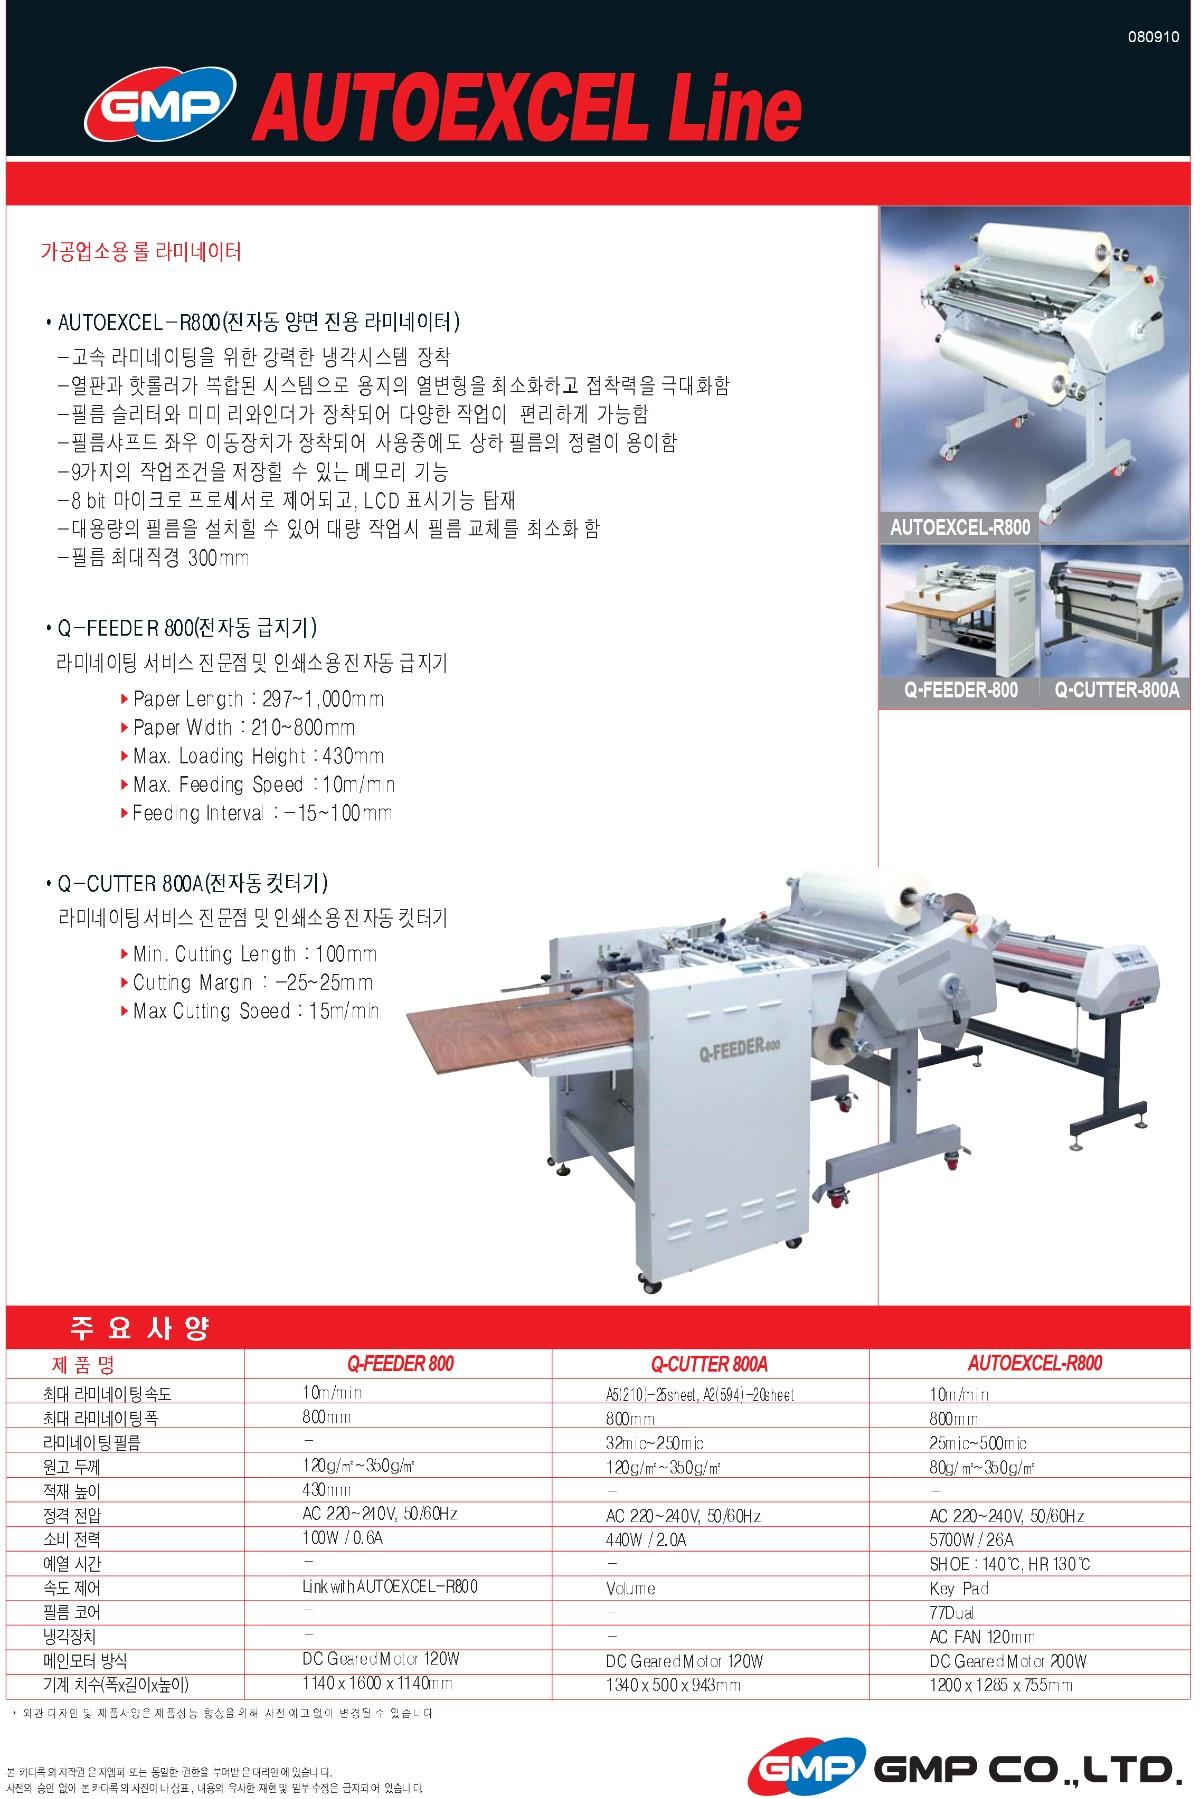 Autoexcel-line_K-2.jpg